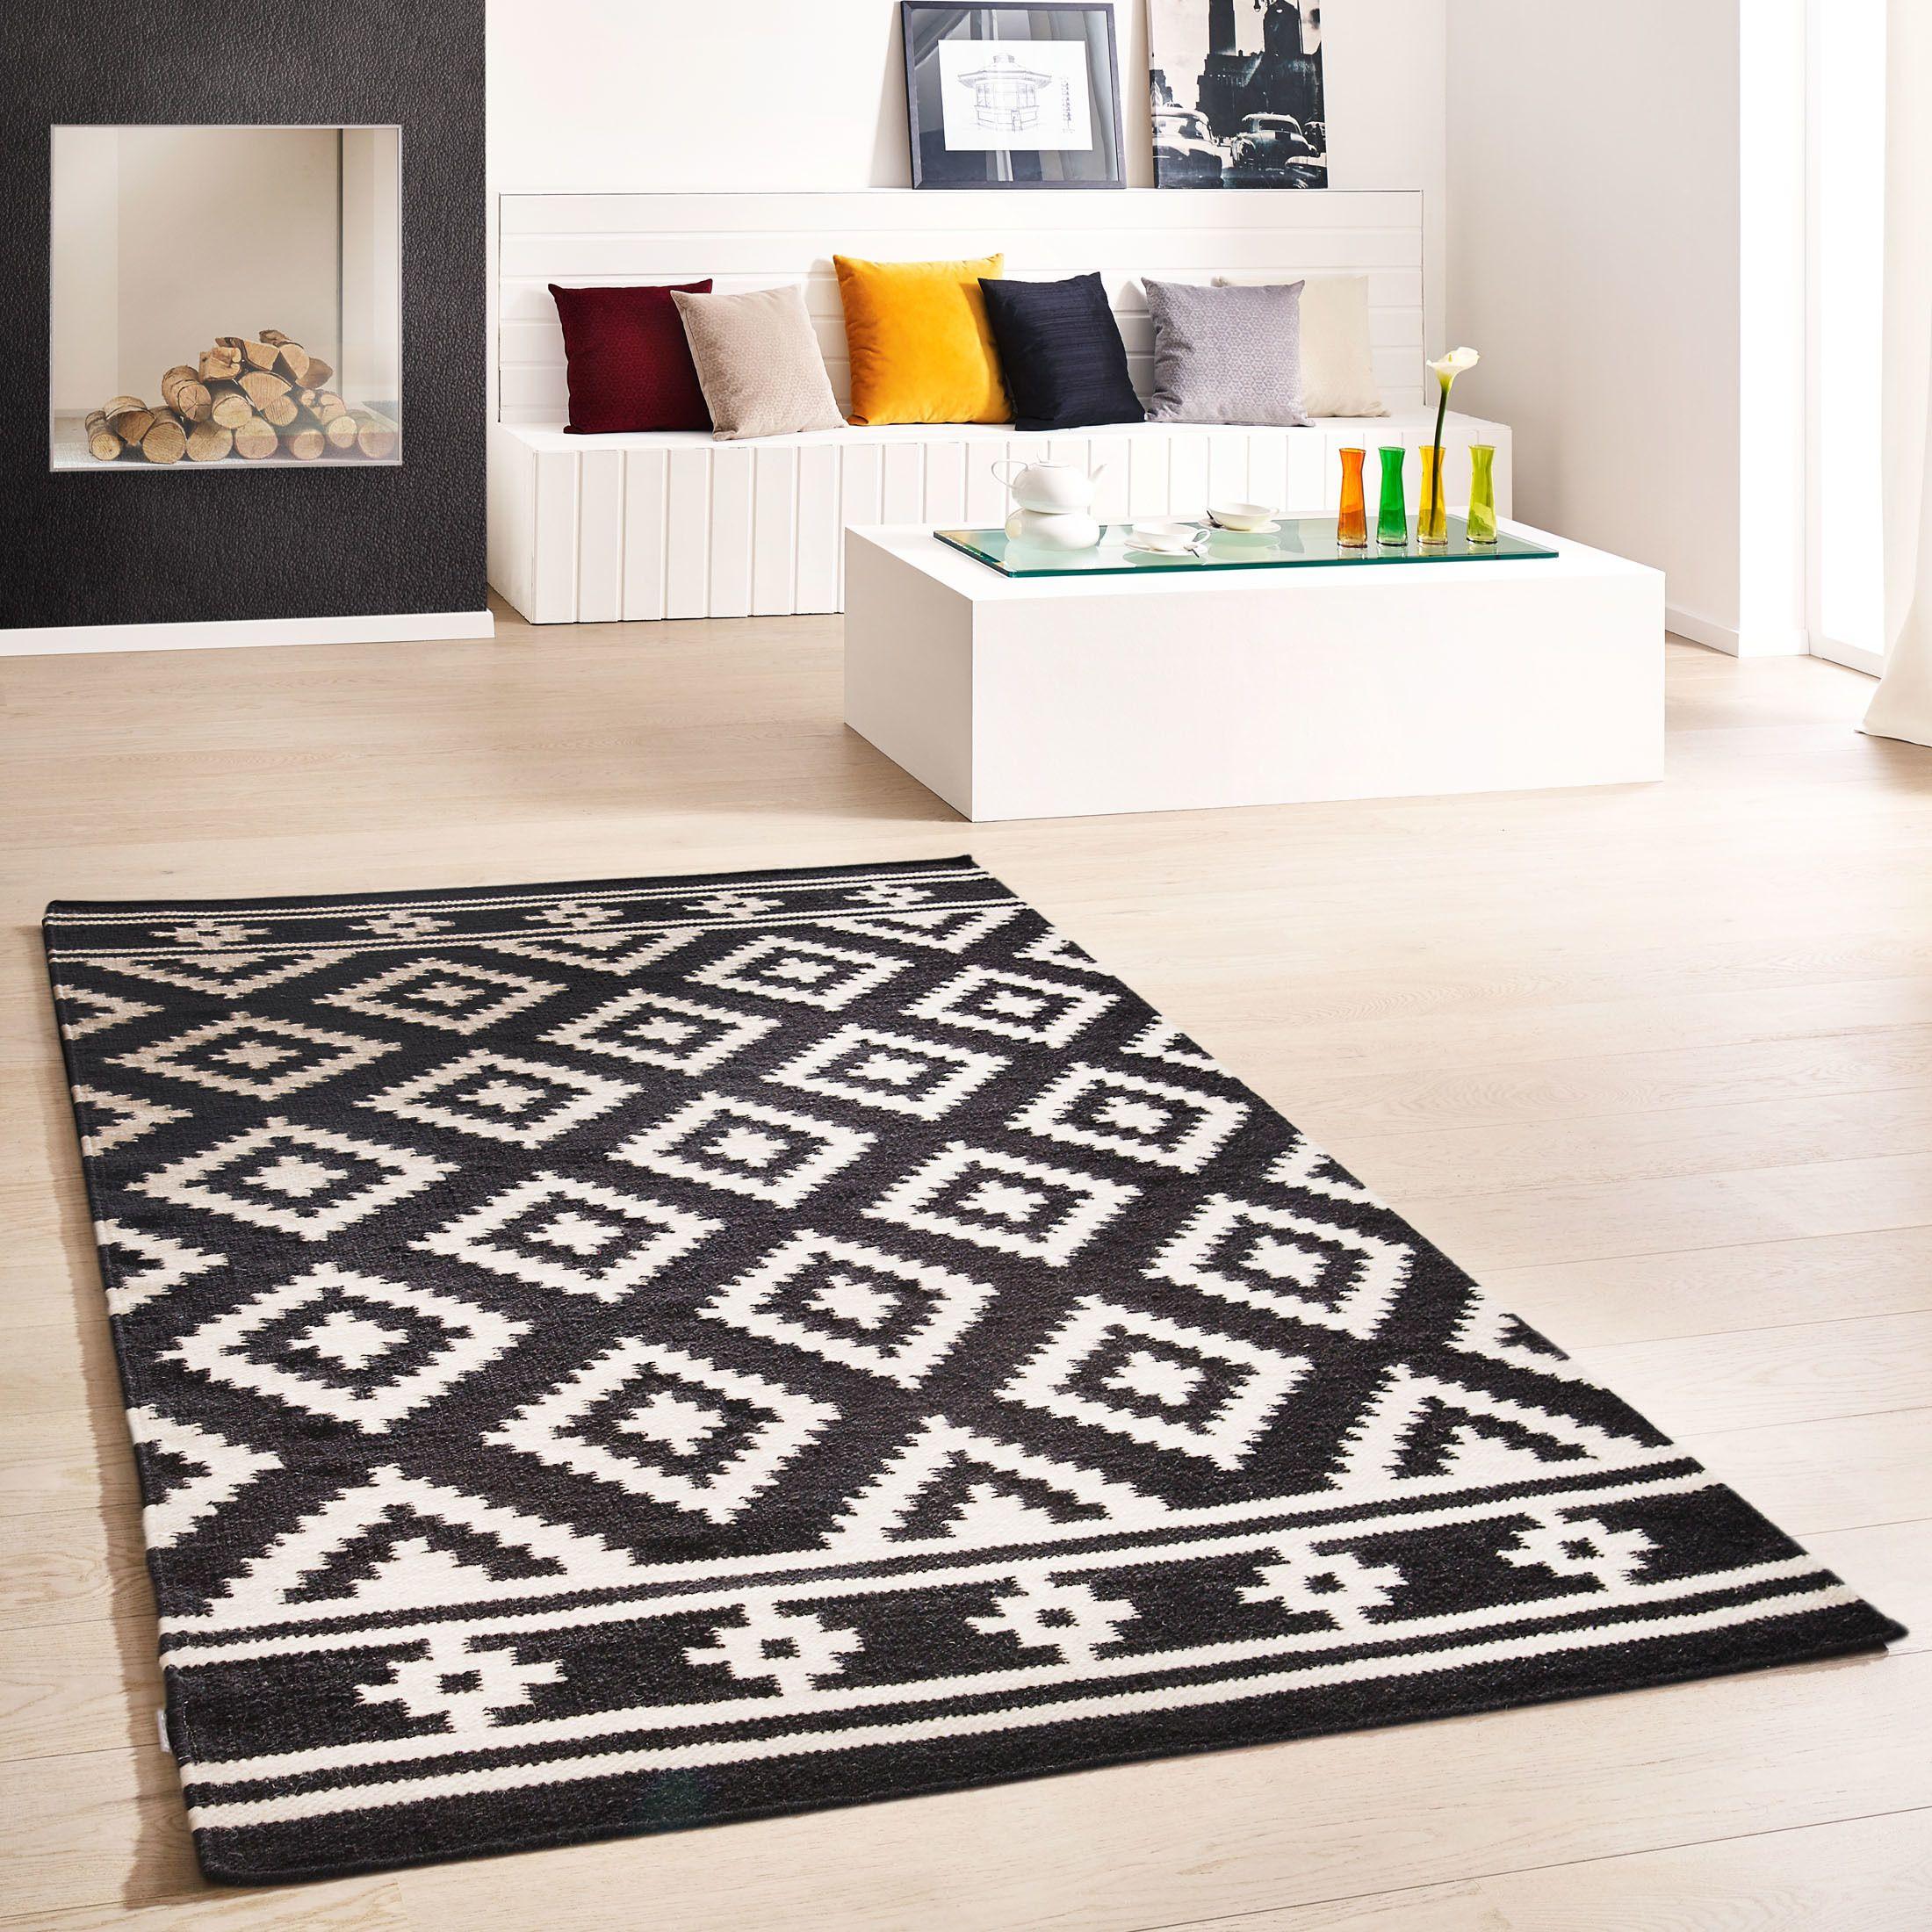 Mailani Teppich Kelim Teppich Moderne Teppiche